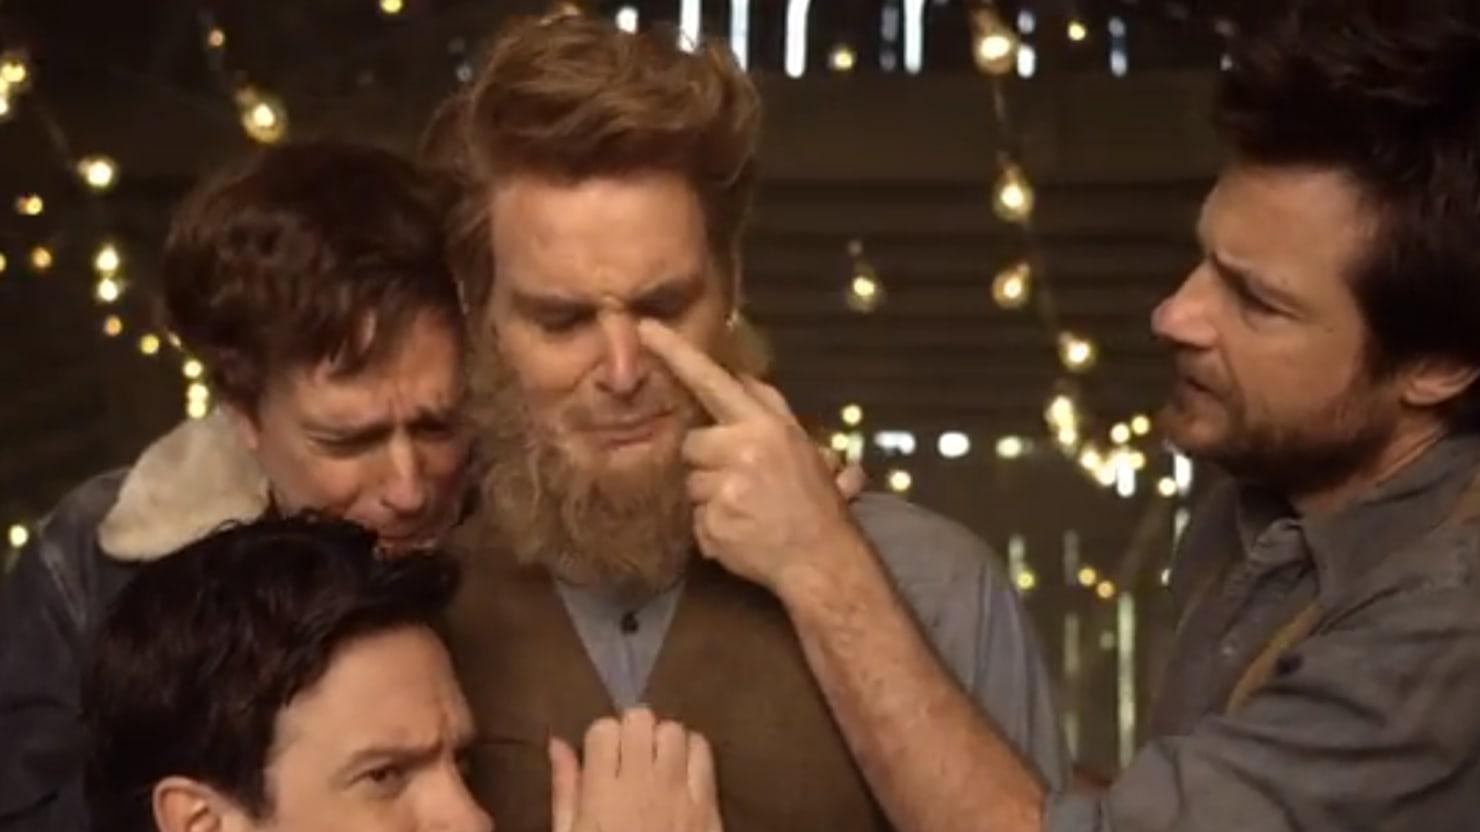 Mumford & Sons' Hilarious Parody Video, Feat. Jason Sudeikis, Jason Bateman, More